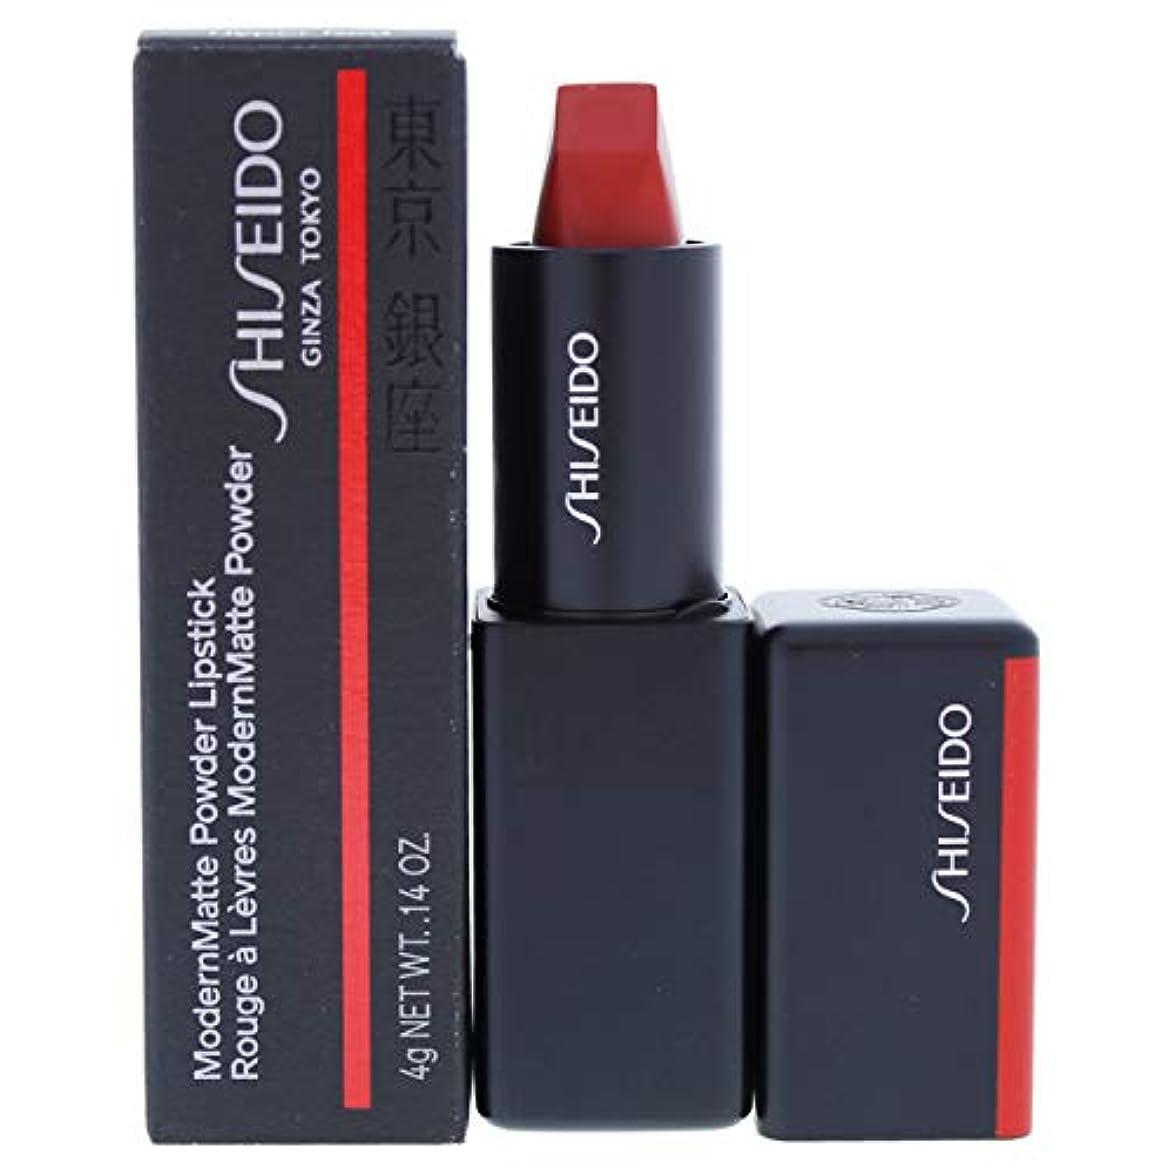 資生堂 ModernMatte Powder Lipstick - # 514 Hyper Red (True Red) 4g/0.14oz並行輸入品